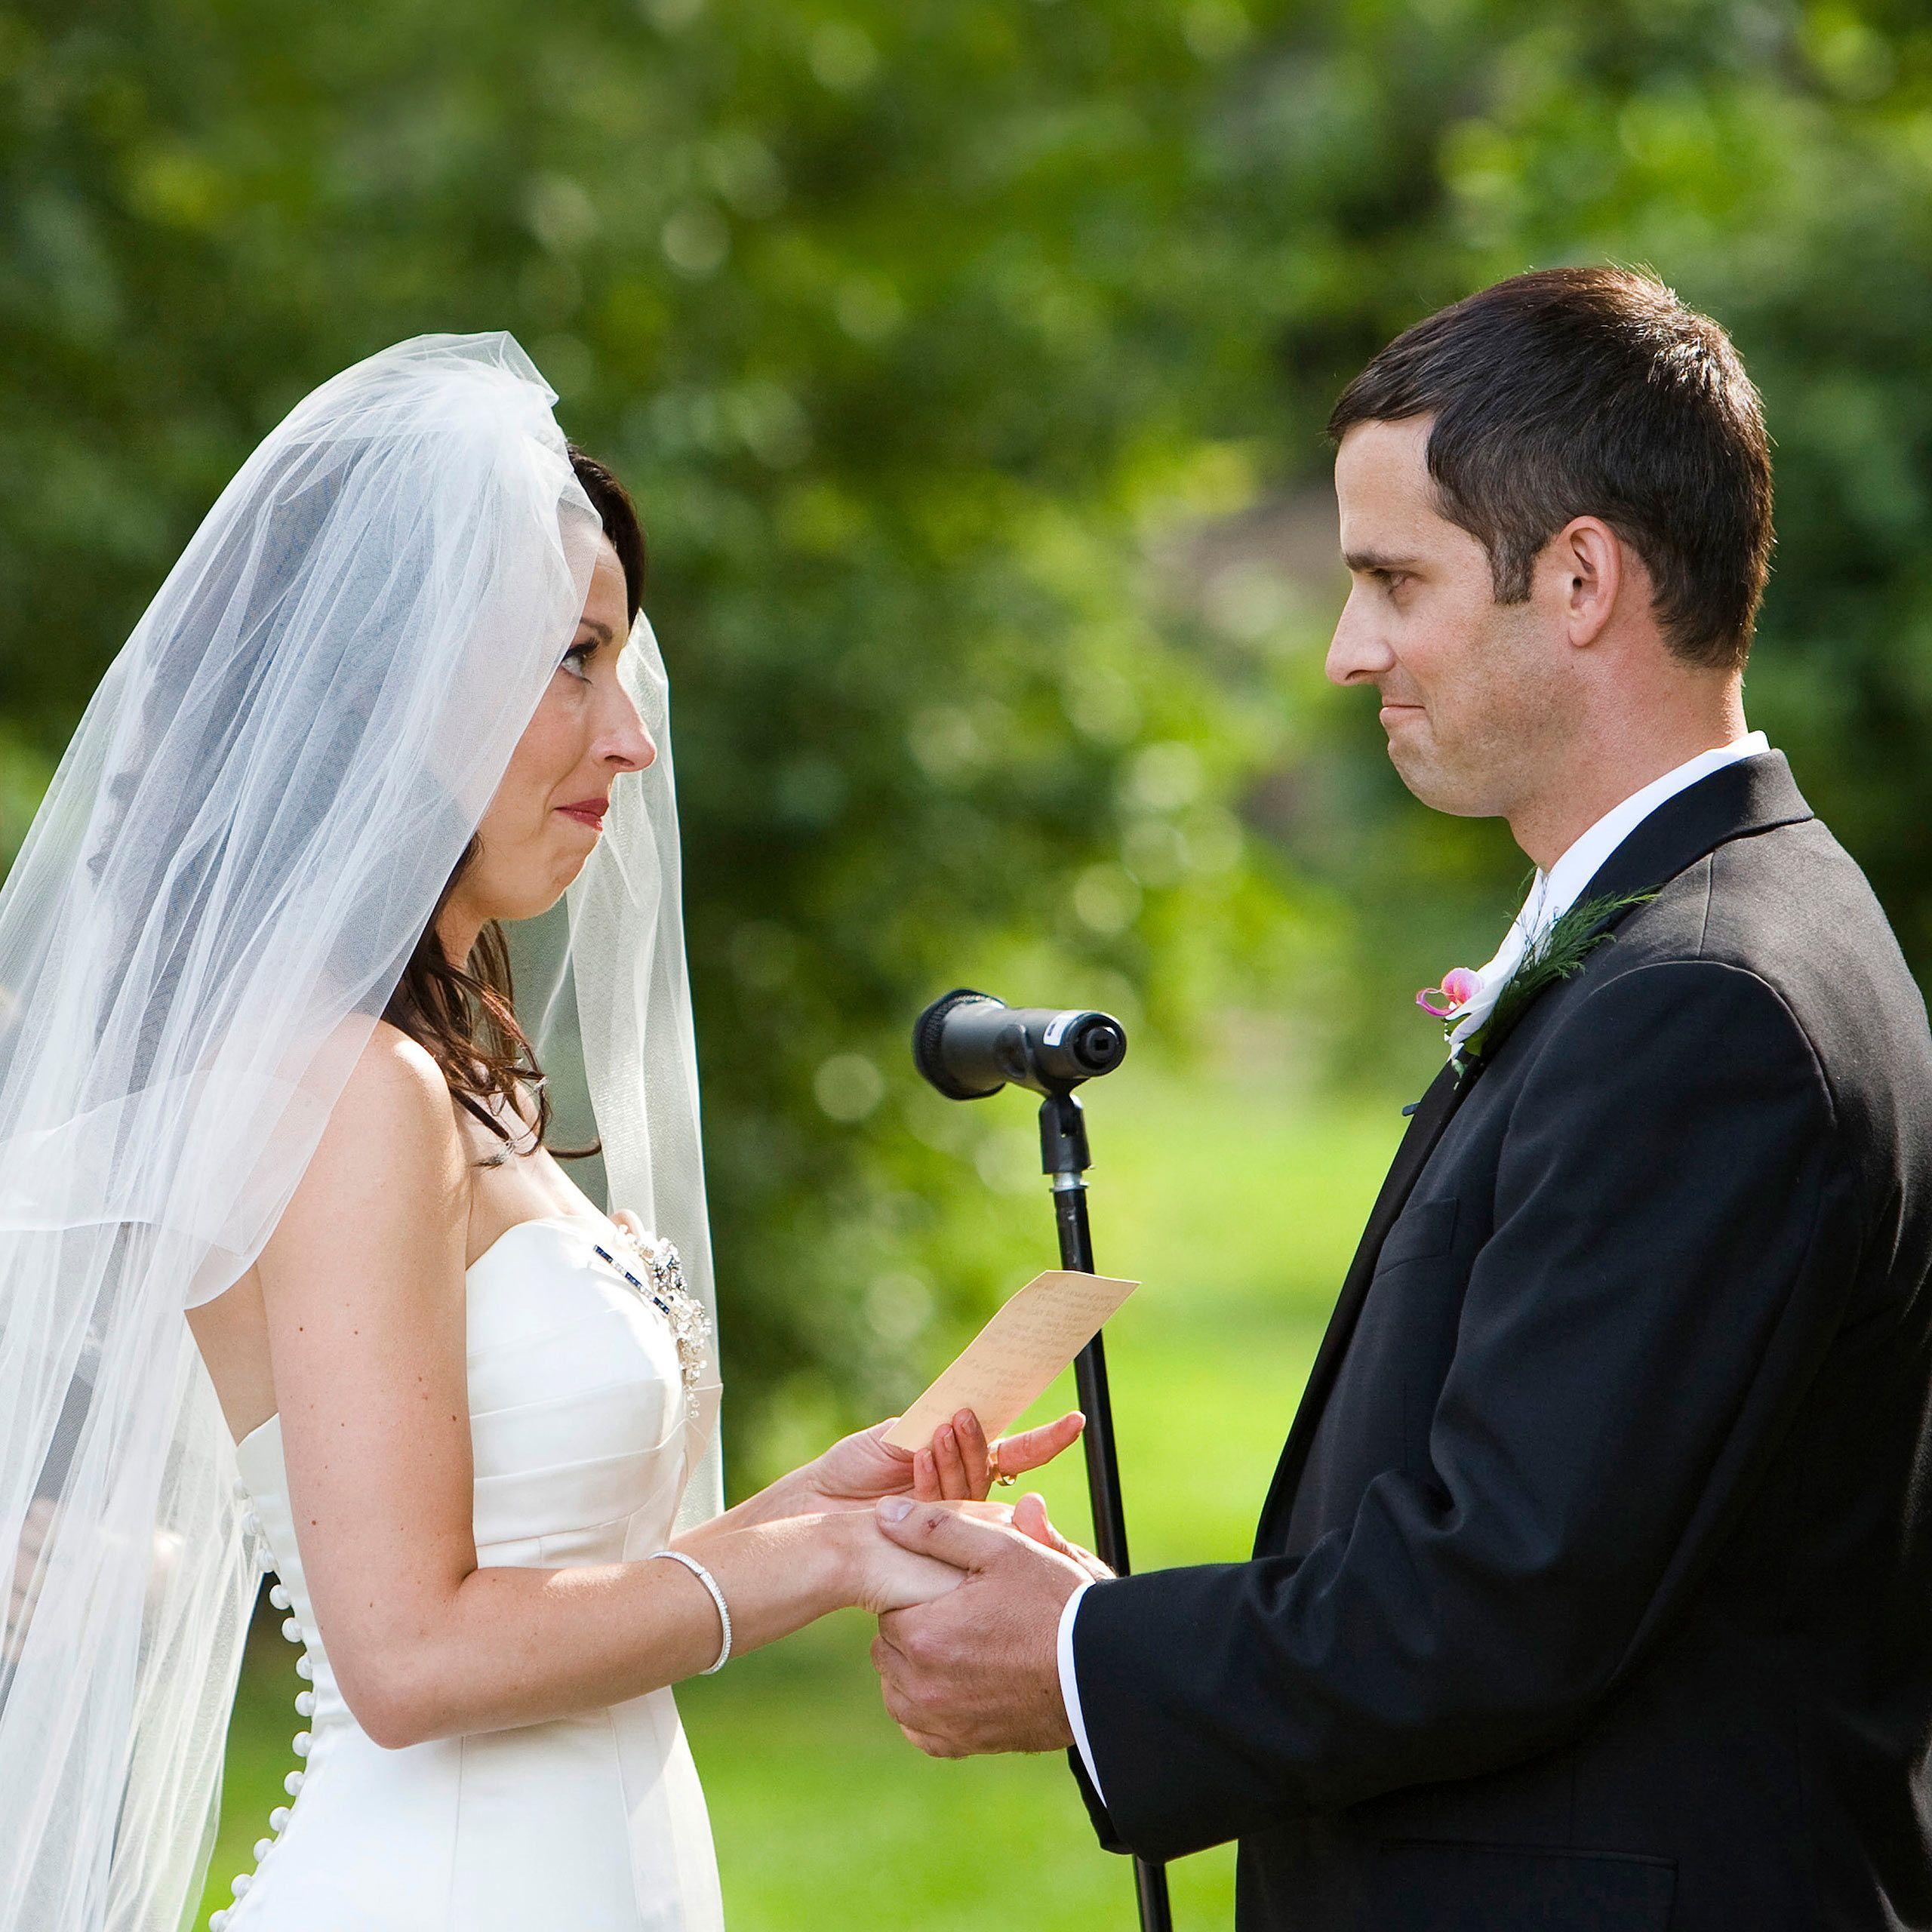 008-Lyons-wedding-photographer.jpg